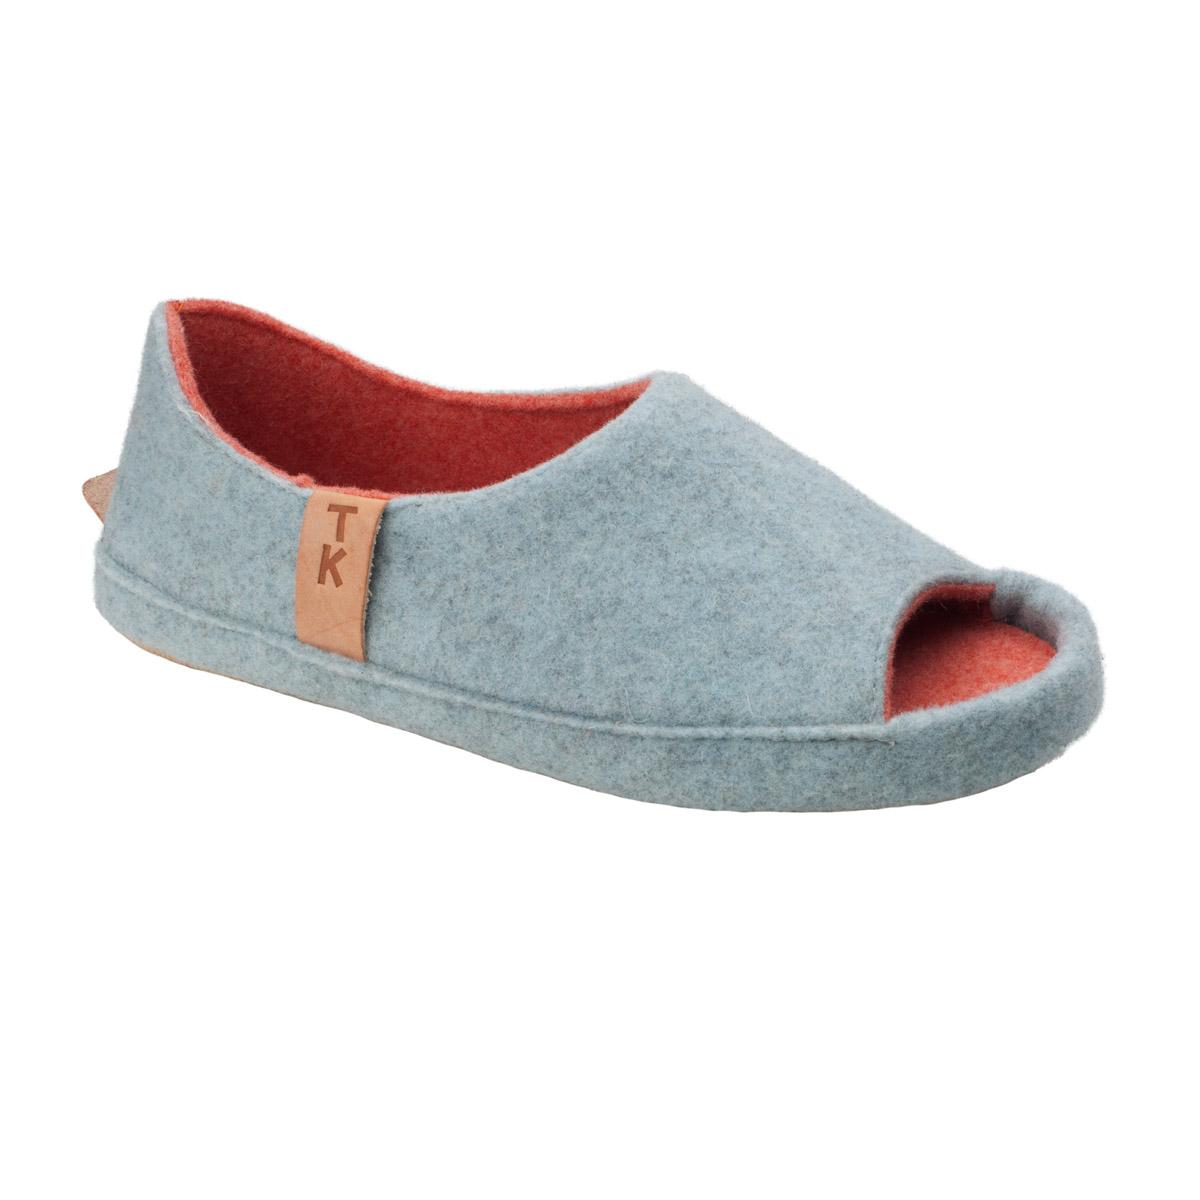 Handmade ethically made slippers